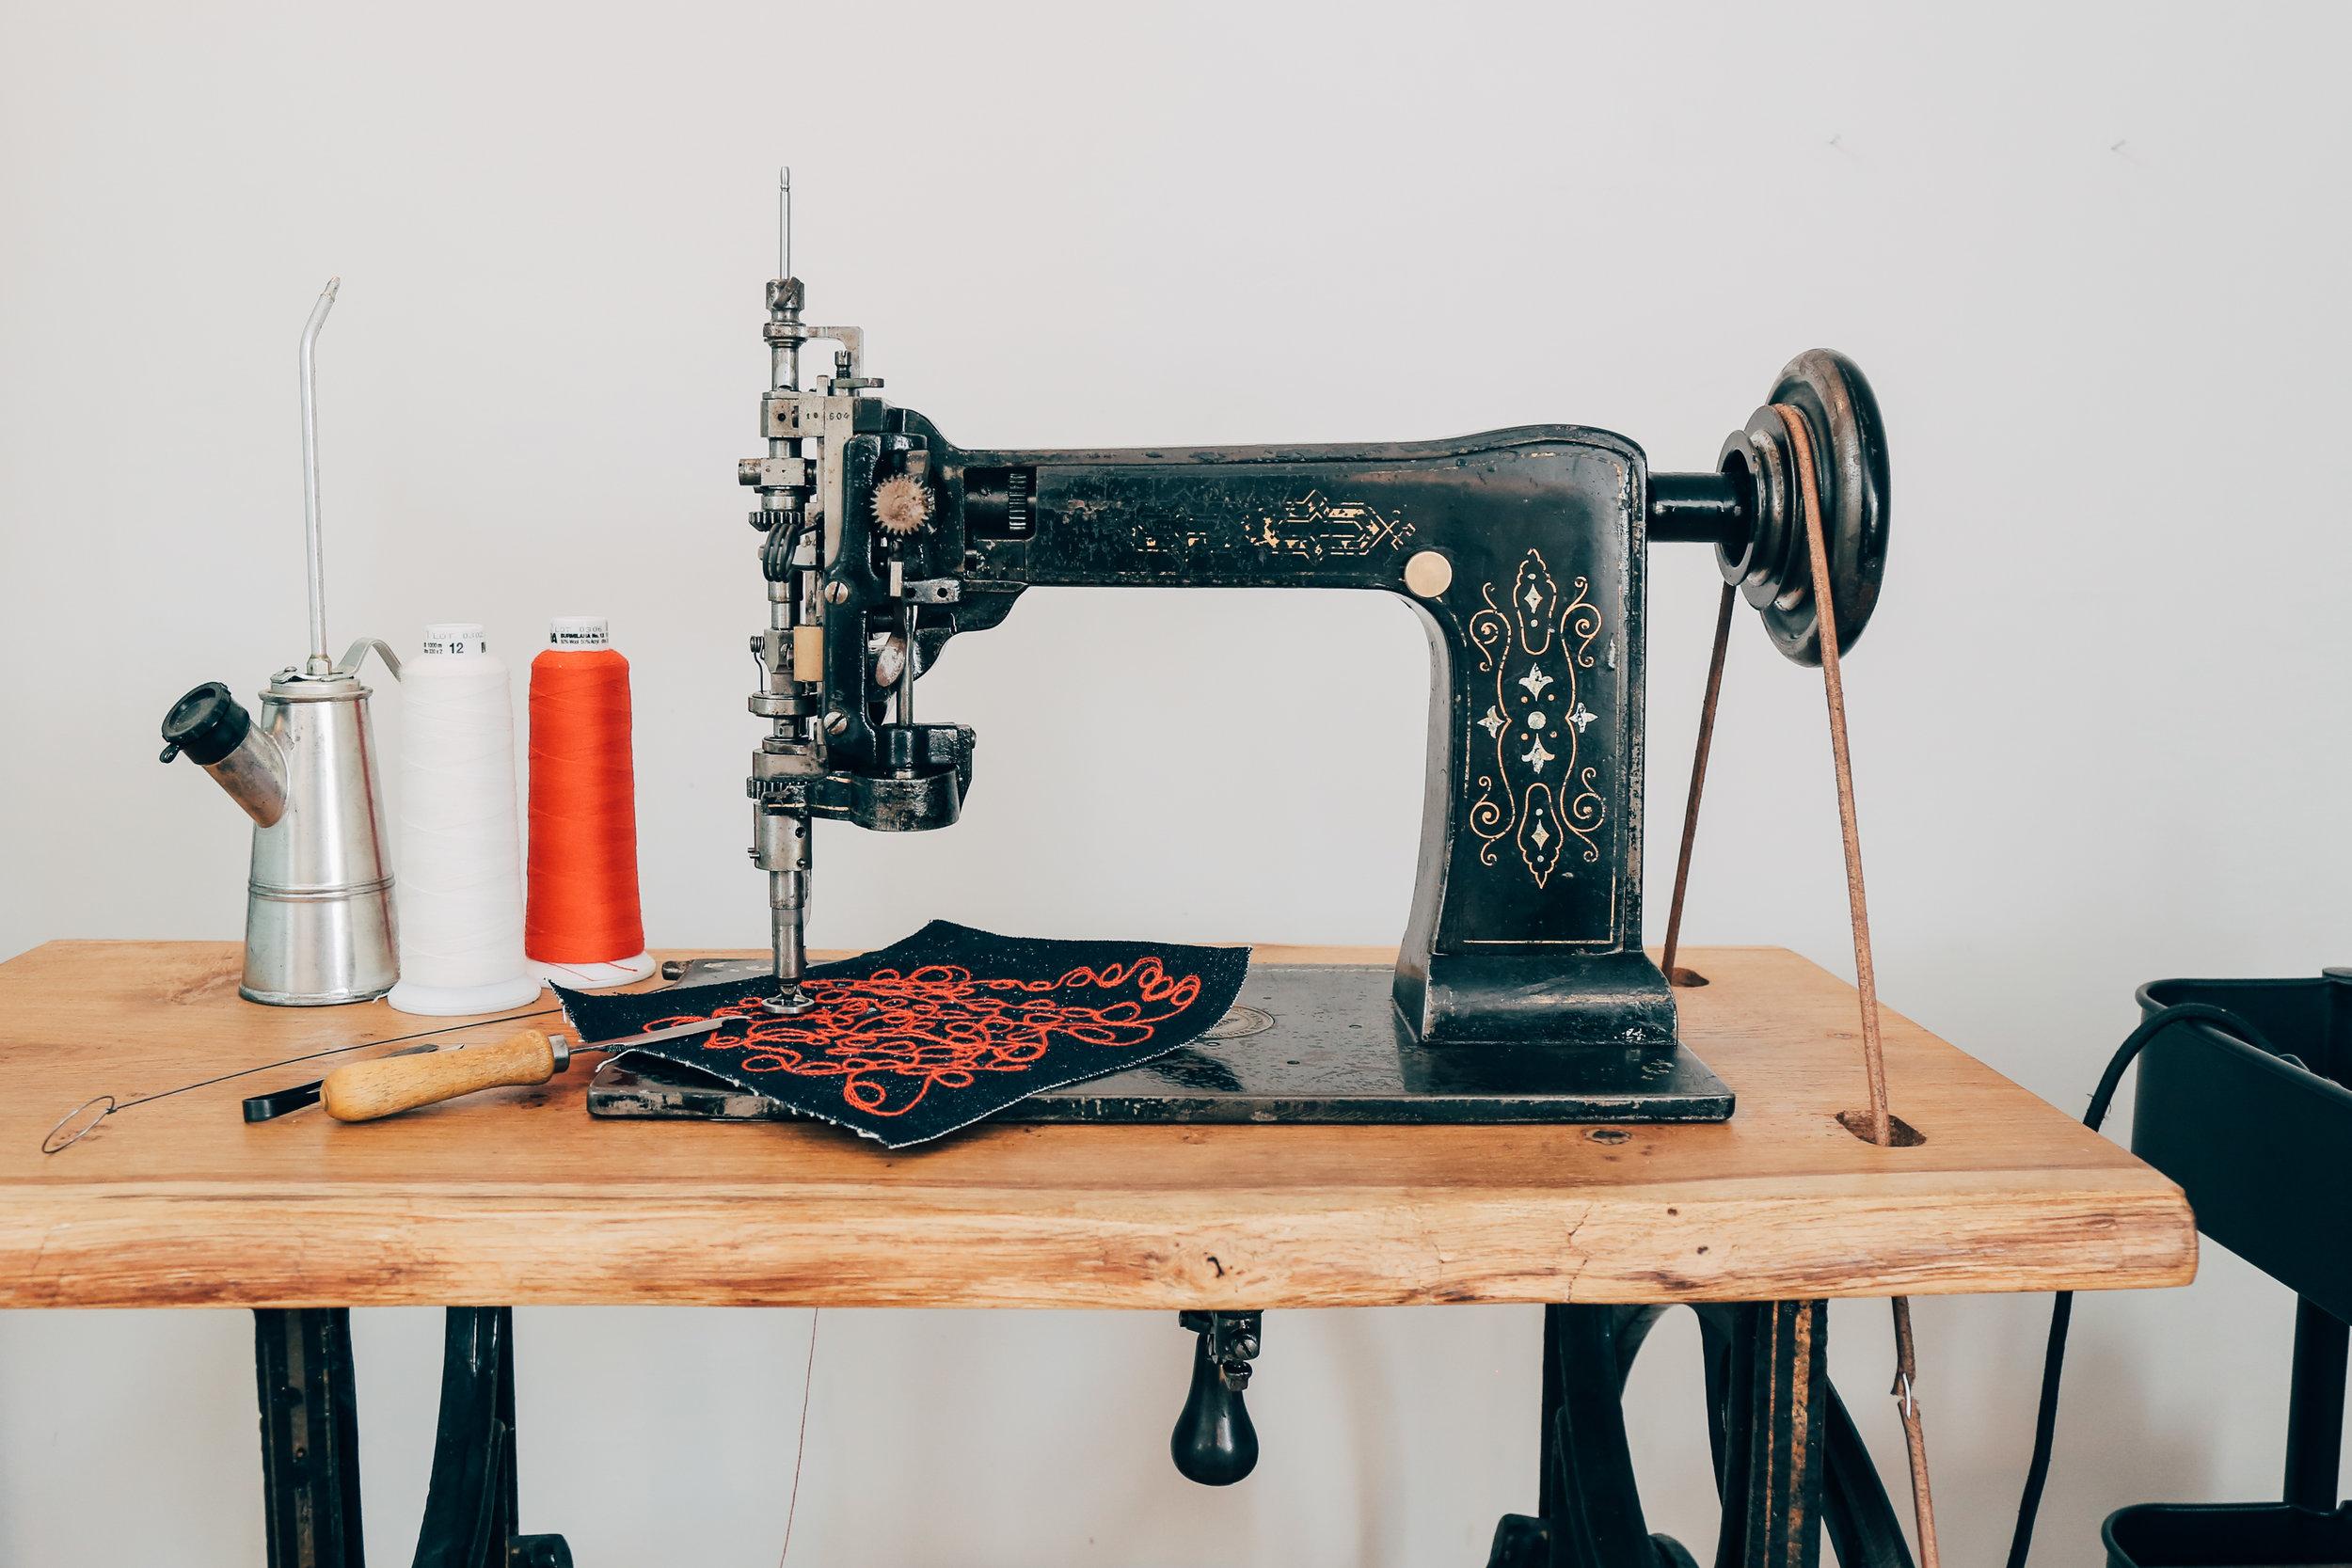 Lintz & Eckhardt 11 Cornely K vintage chainstitch embroidery machine 1